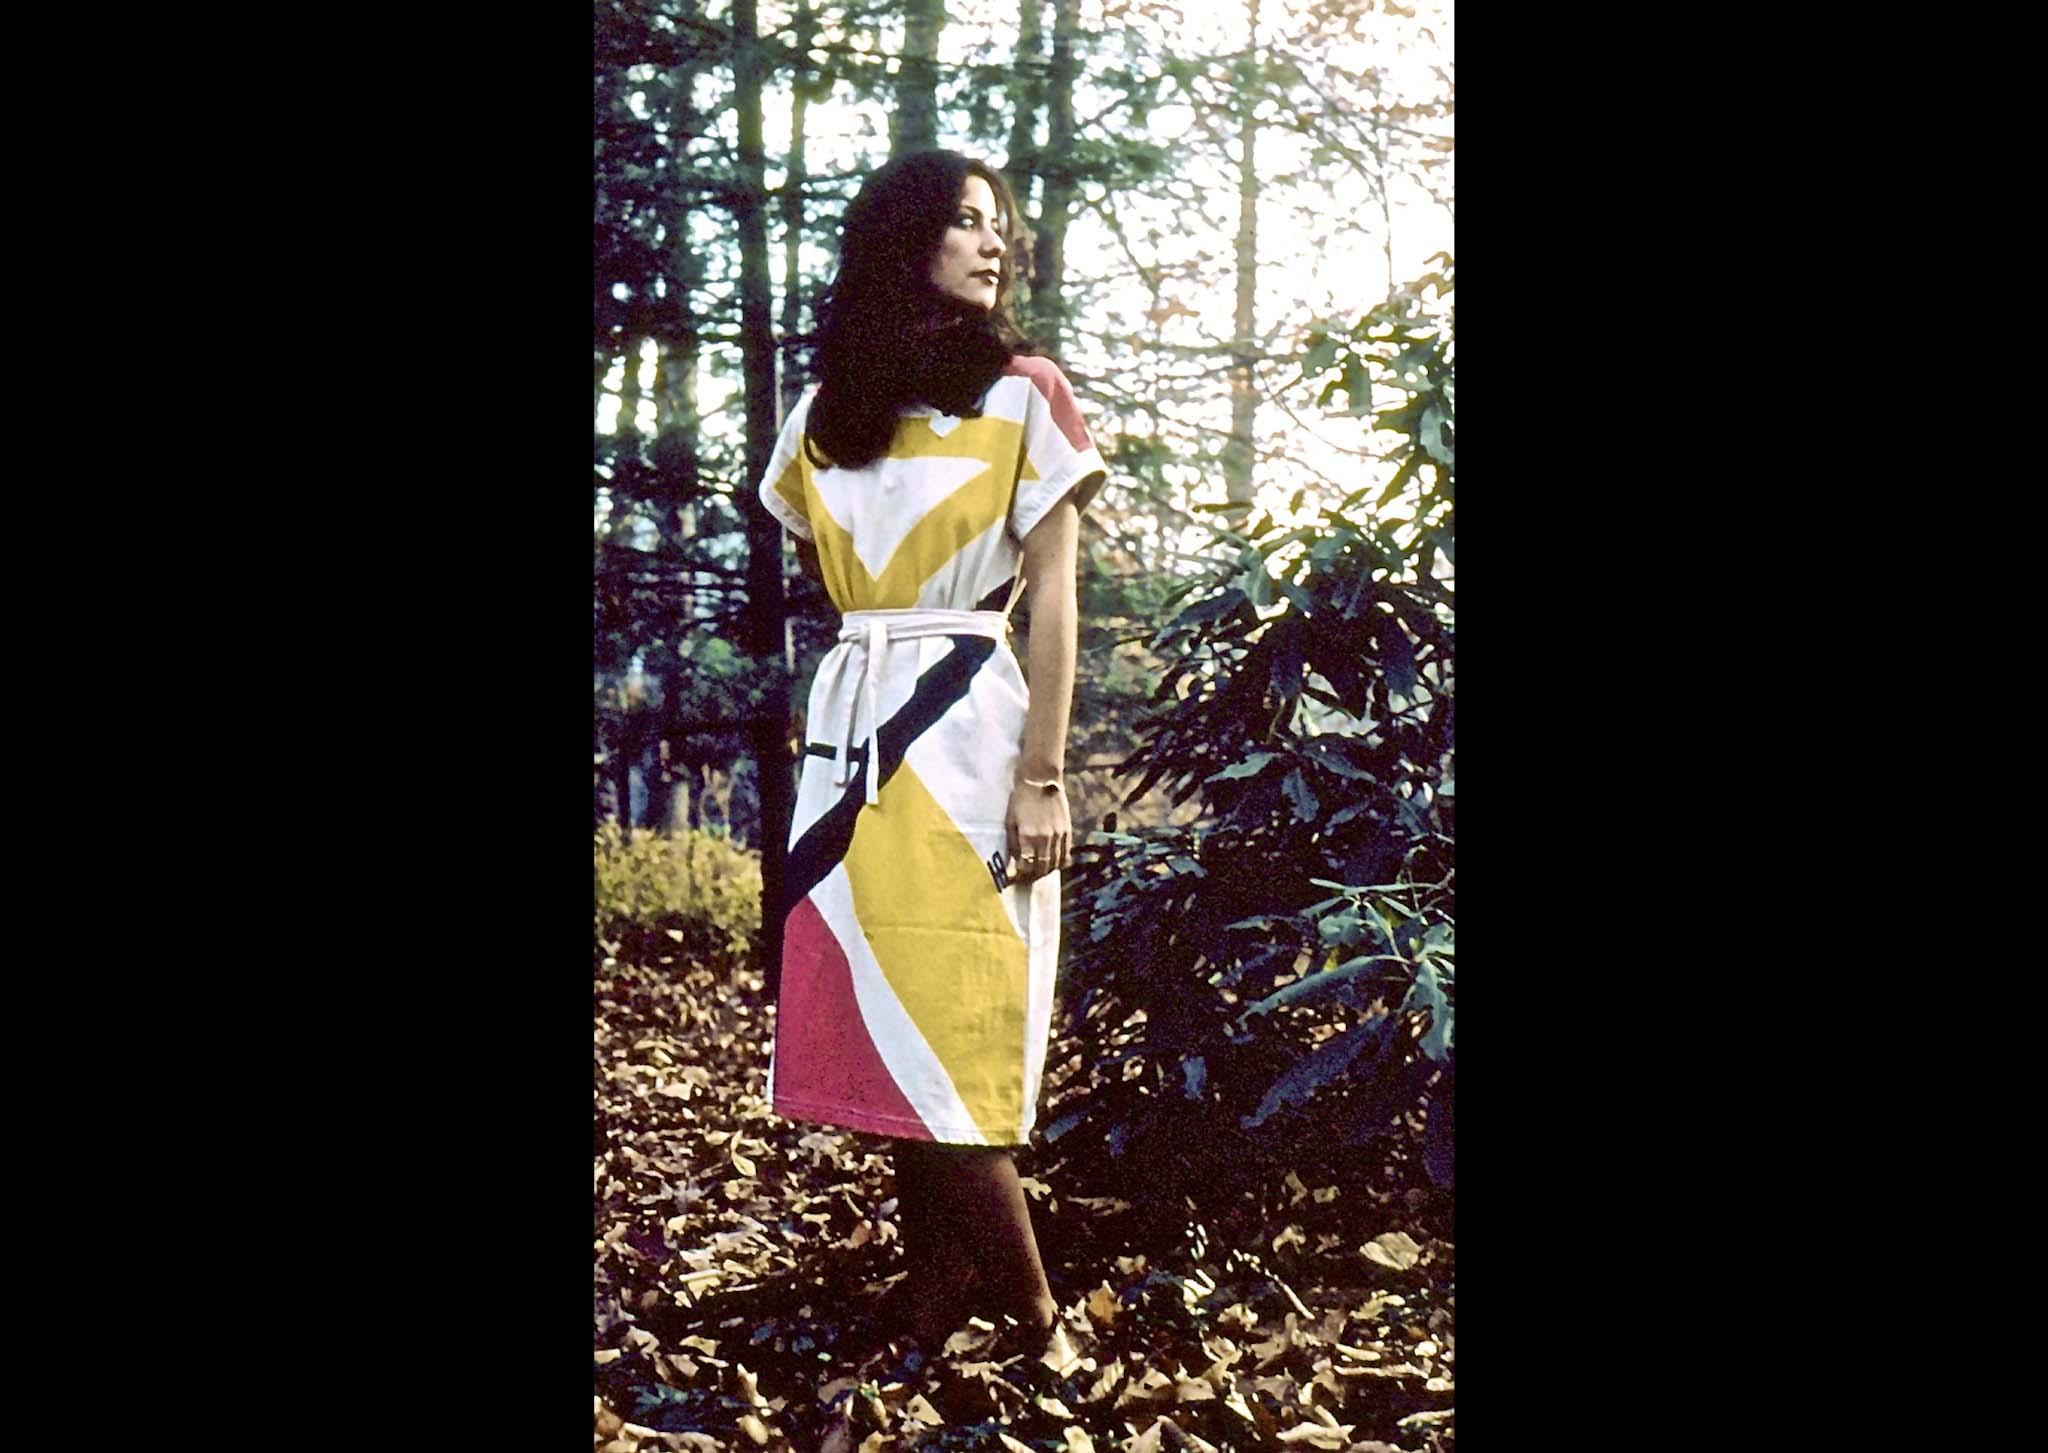 Vestidos - Década de 1980